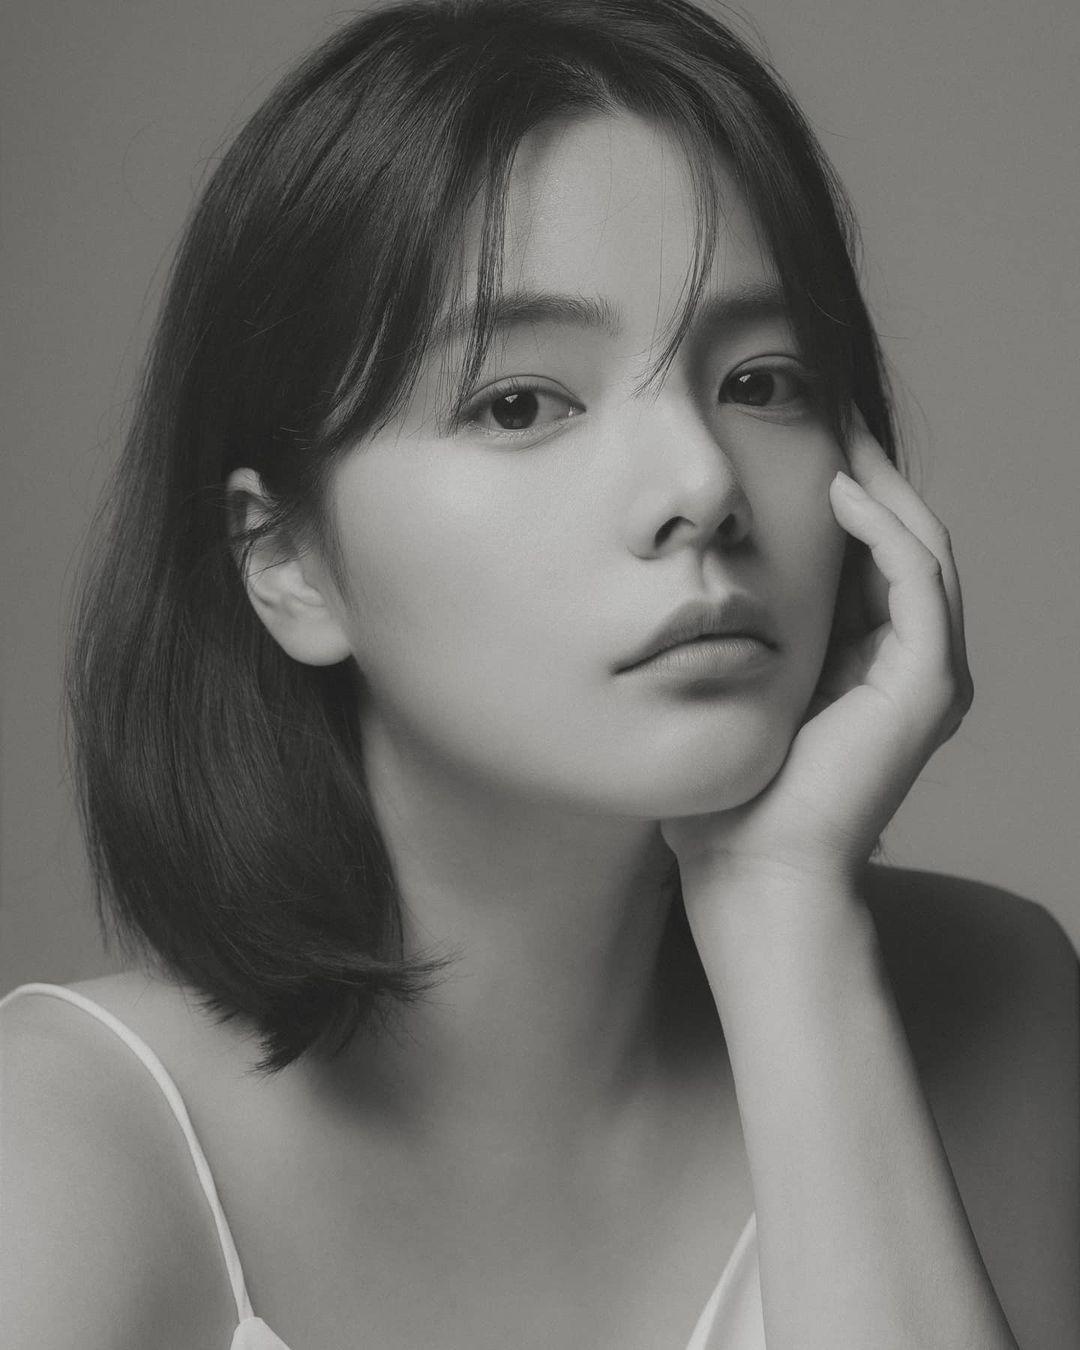 Song Yoo Jung